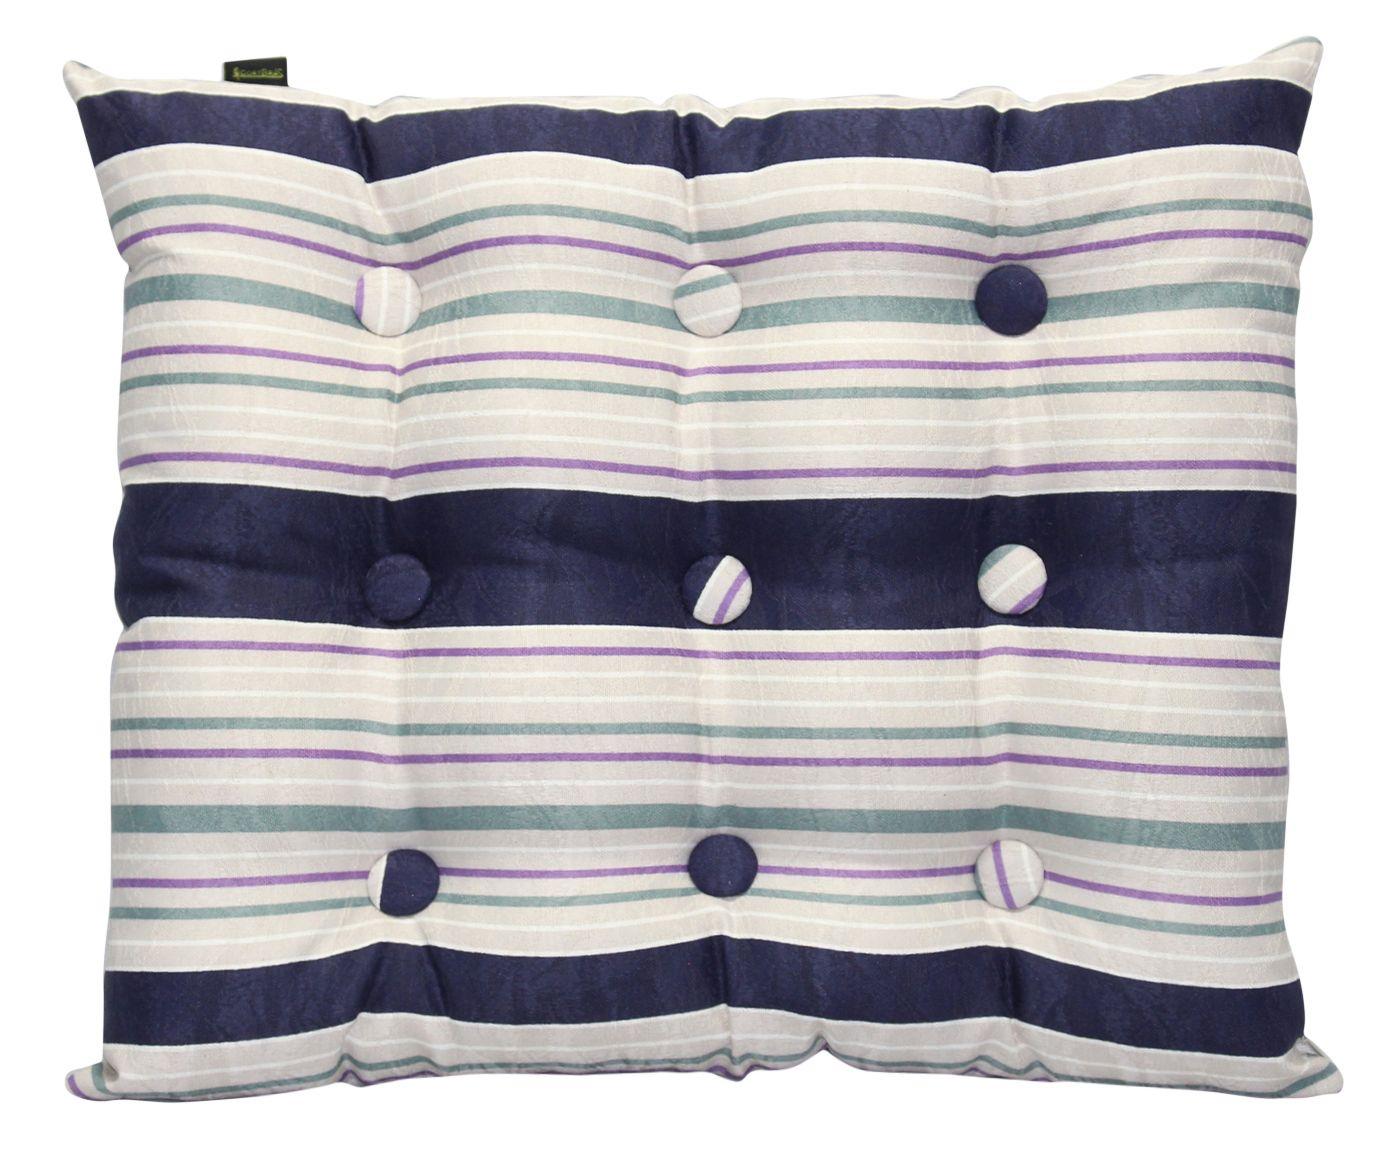 Almofada Zabuton Marble Striped Roxa - 40x50cm   Westwing.com.br